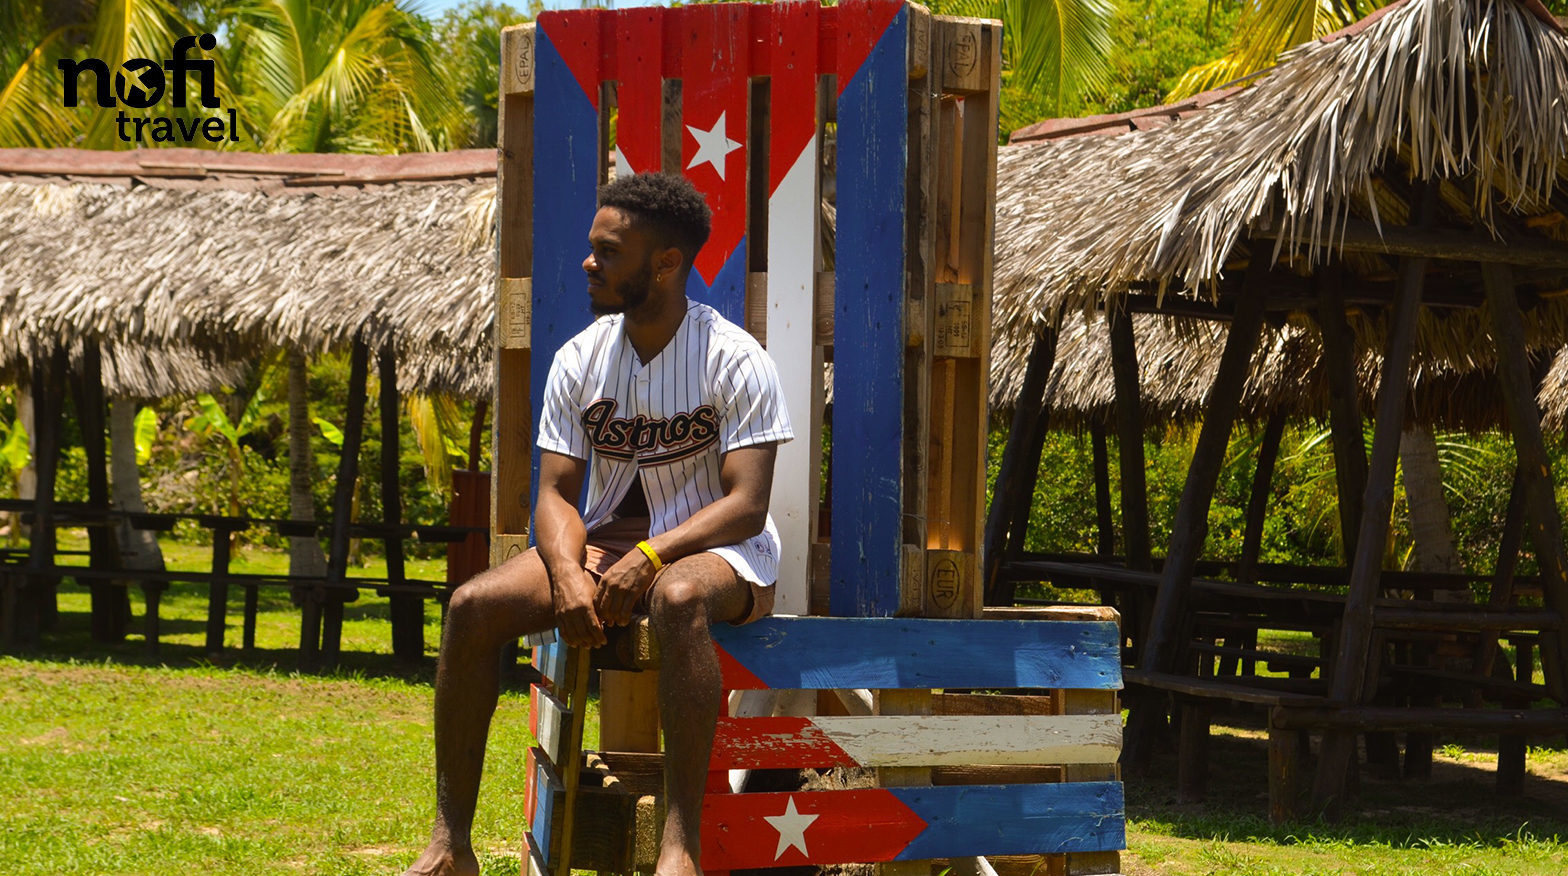 Nofi TRAVEL #6 [CUBA] étape 3: El ultimo Varadero